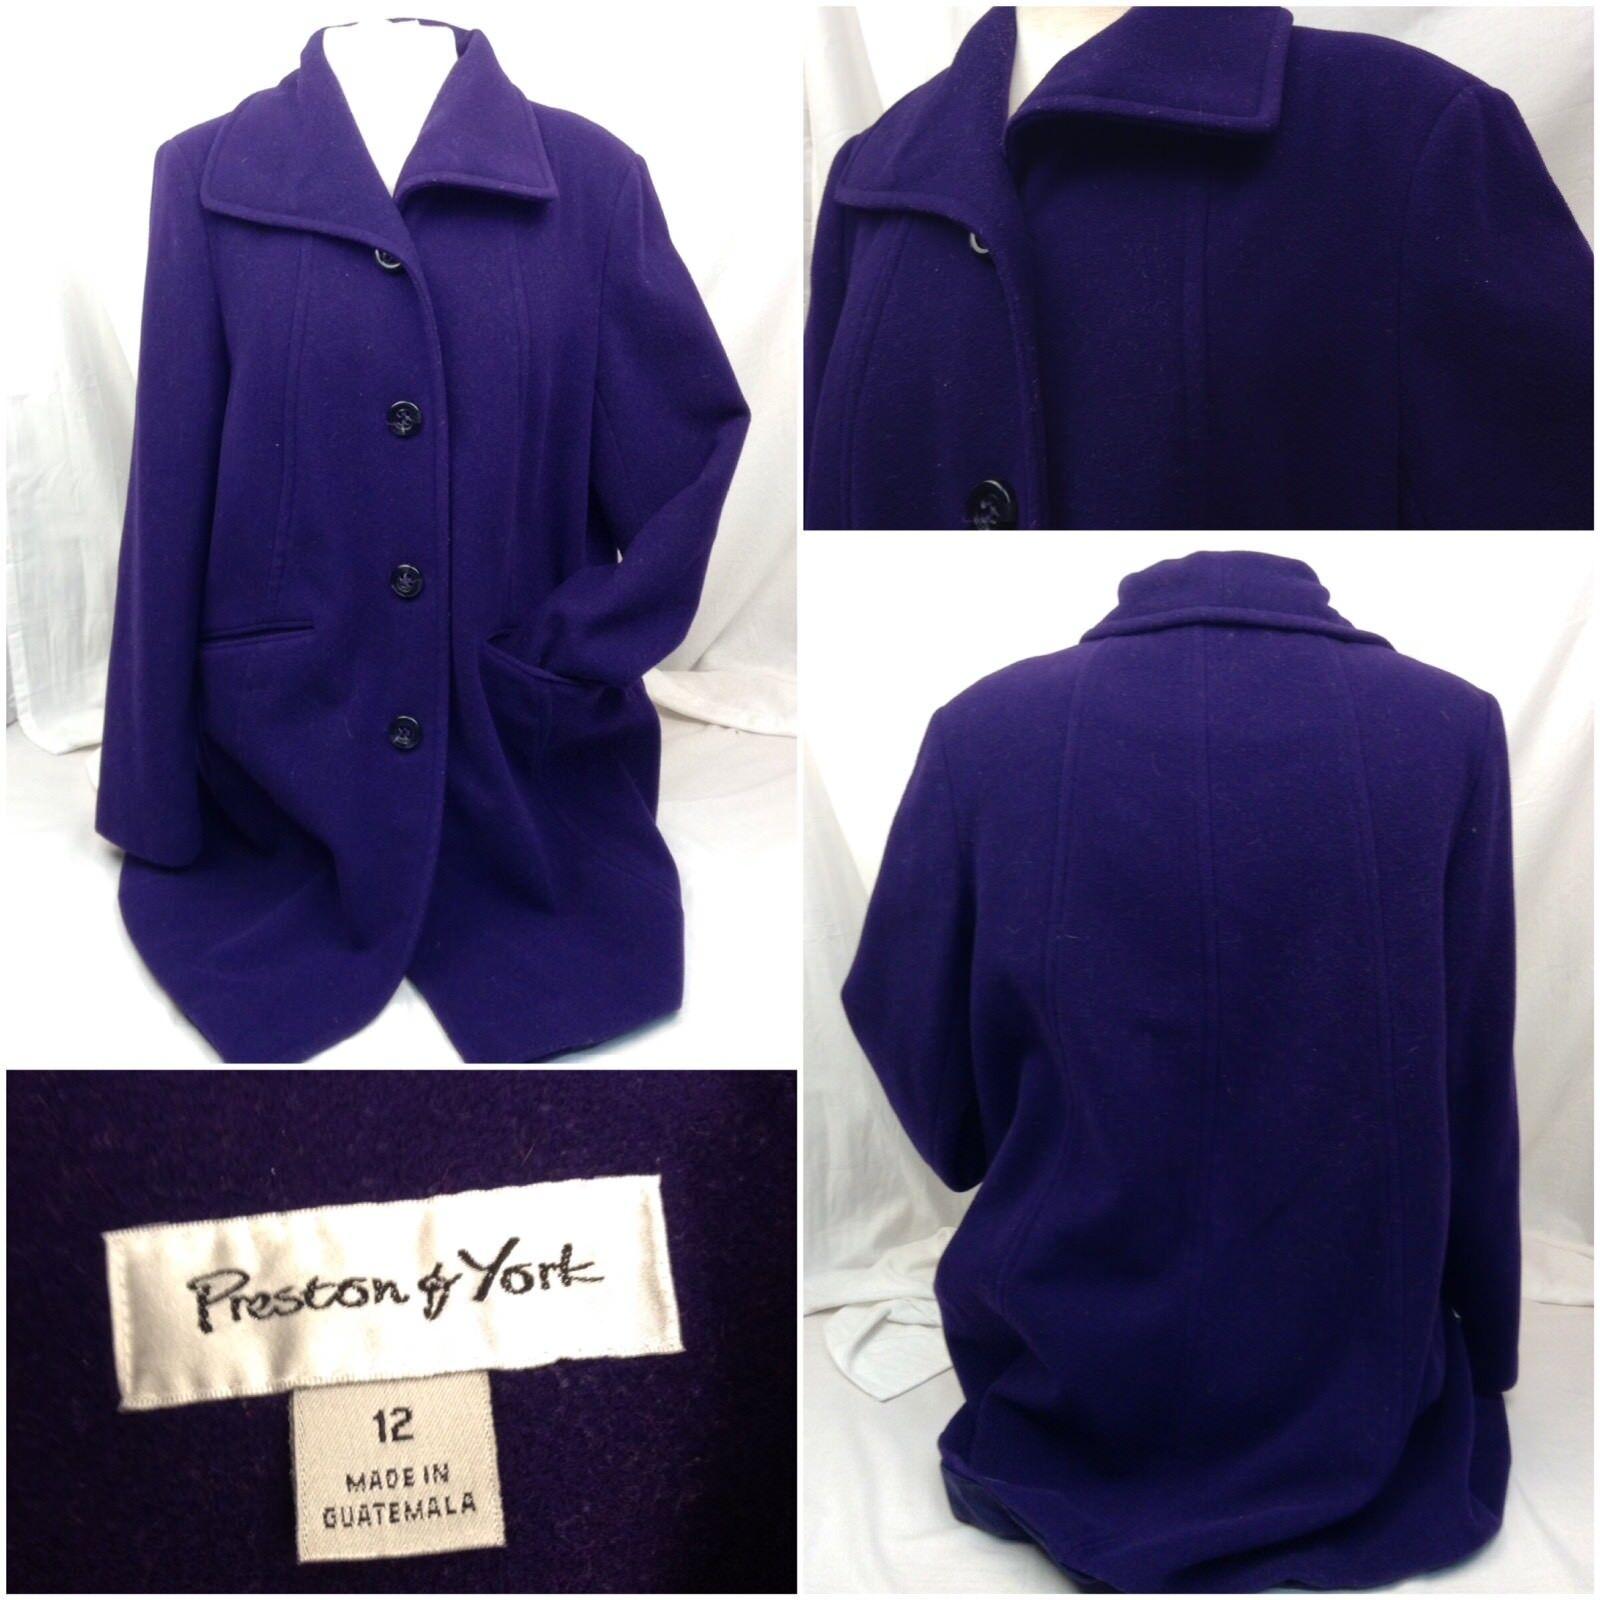 Preston & York Coat 12 Purple Purple Purple Peacoat 4 Button Mint A167 df8183